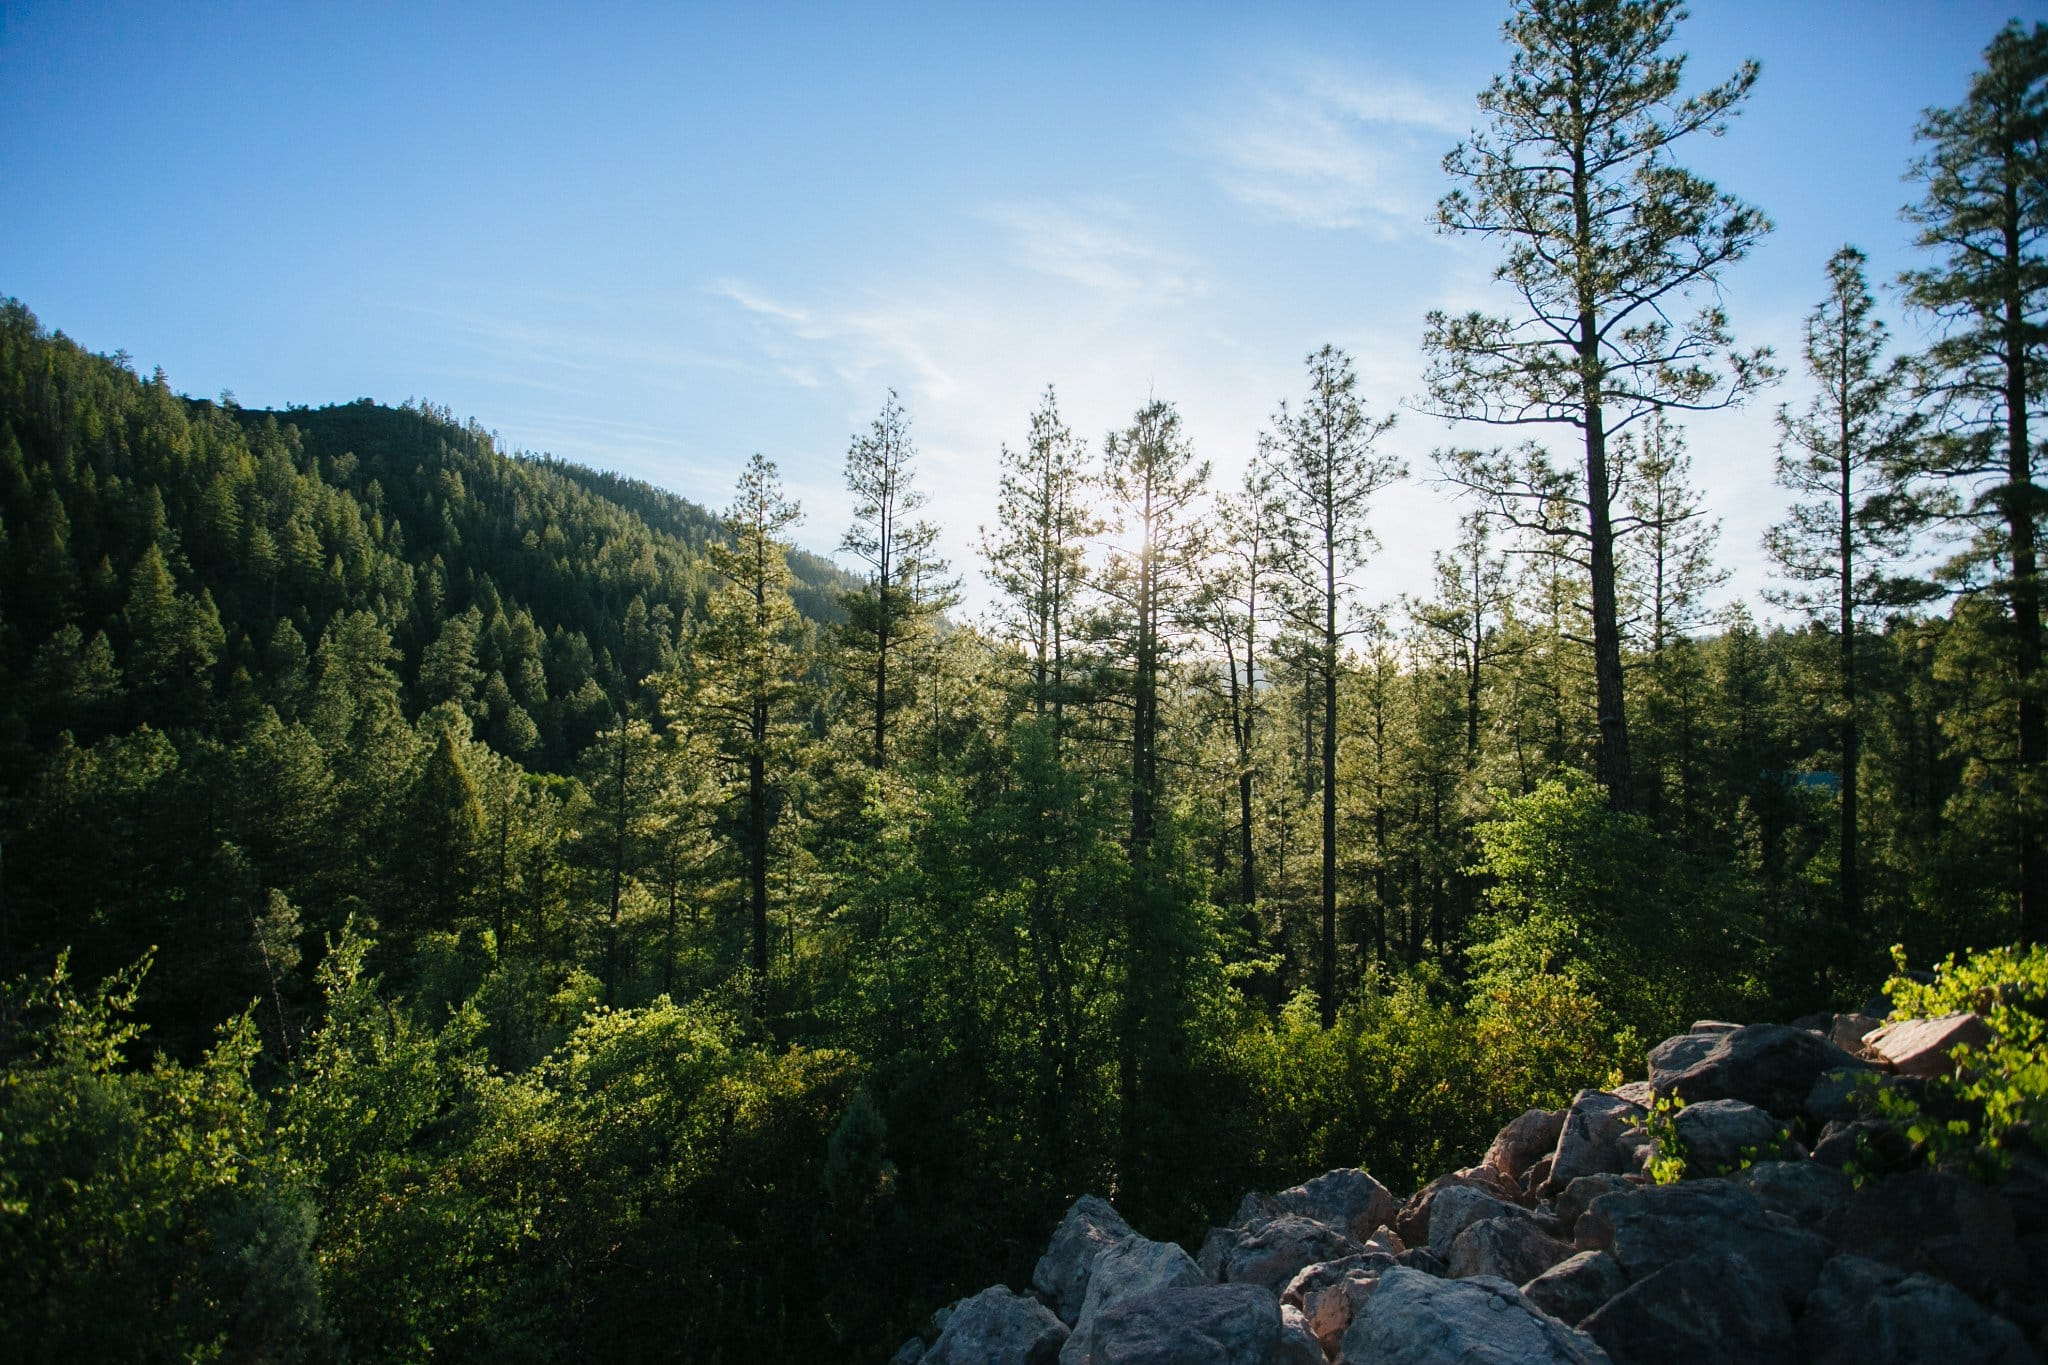 Tonto National Forest, Payson AZ